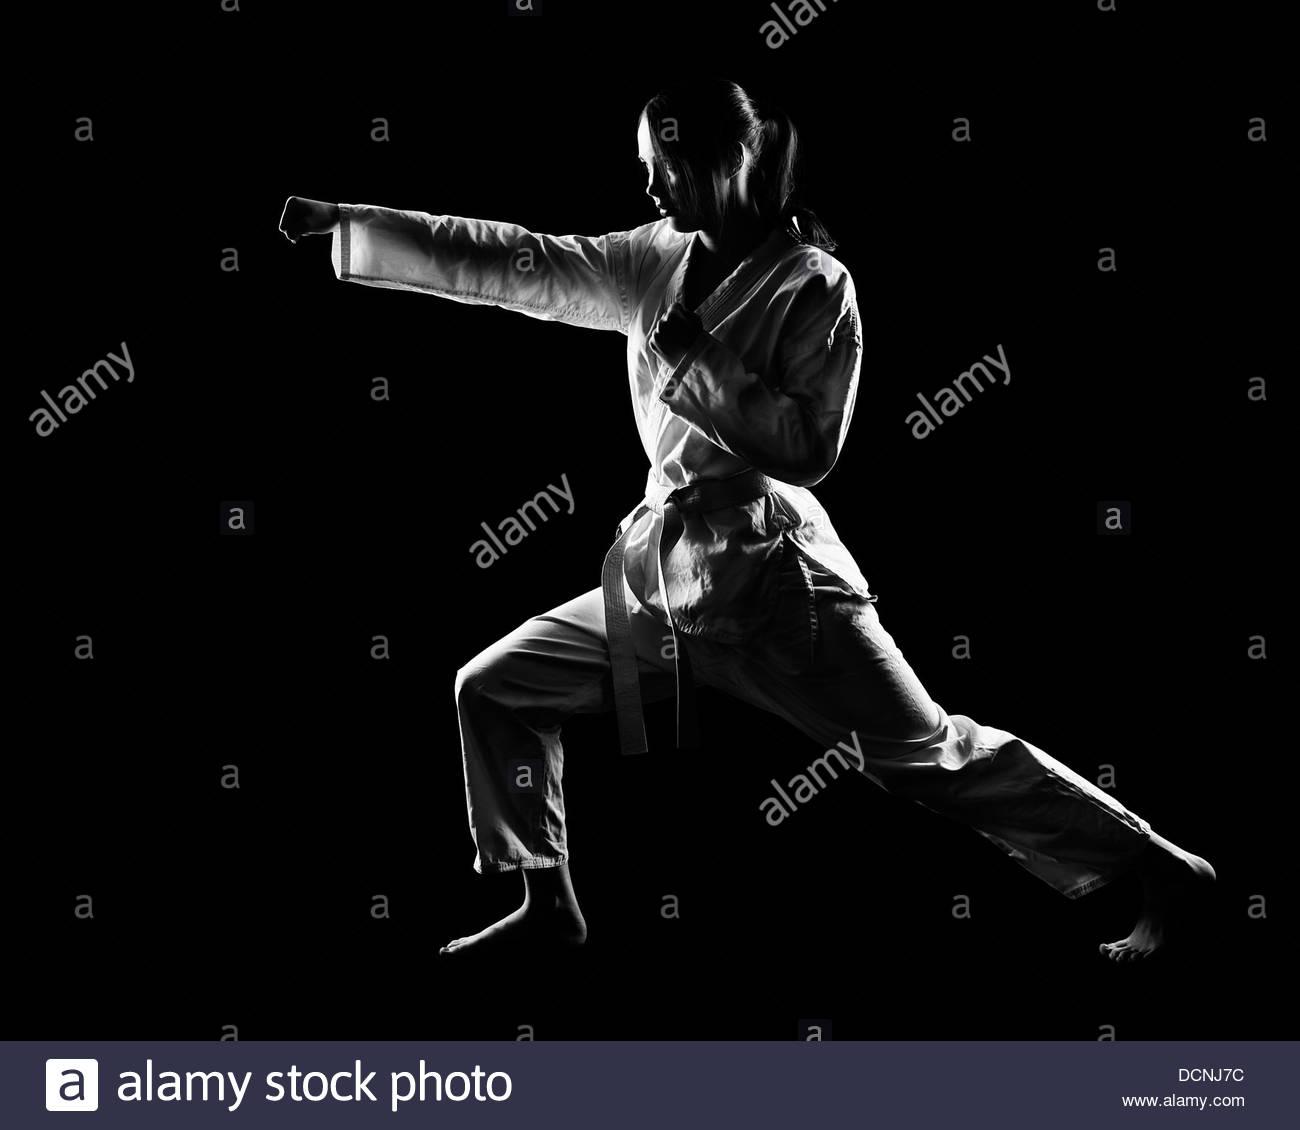 karate girl - Stock Image